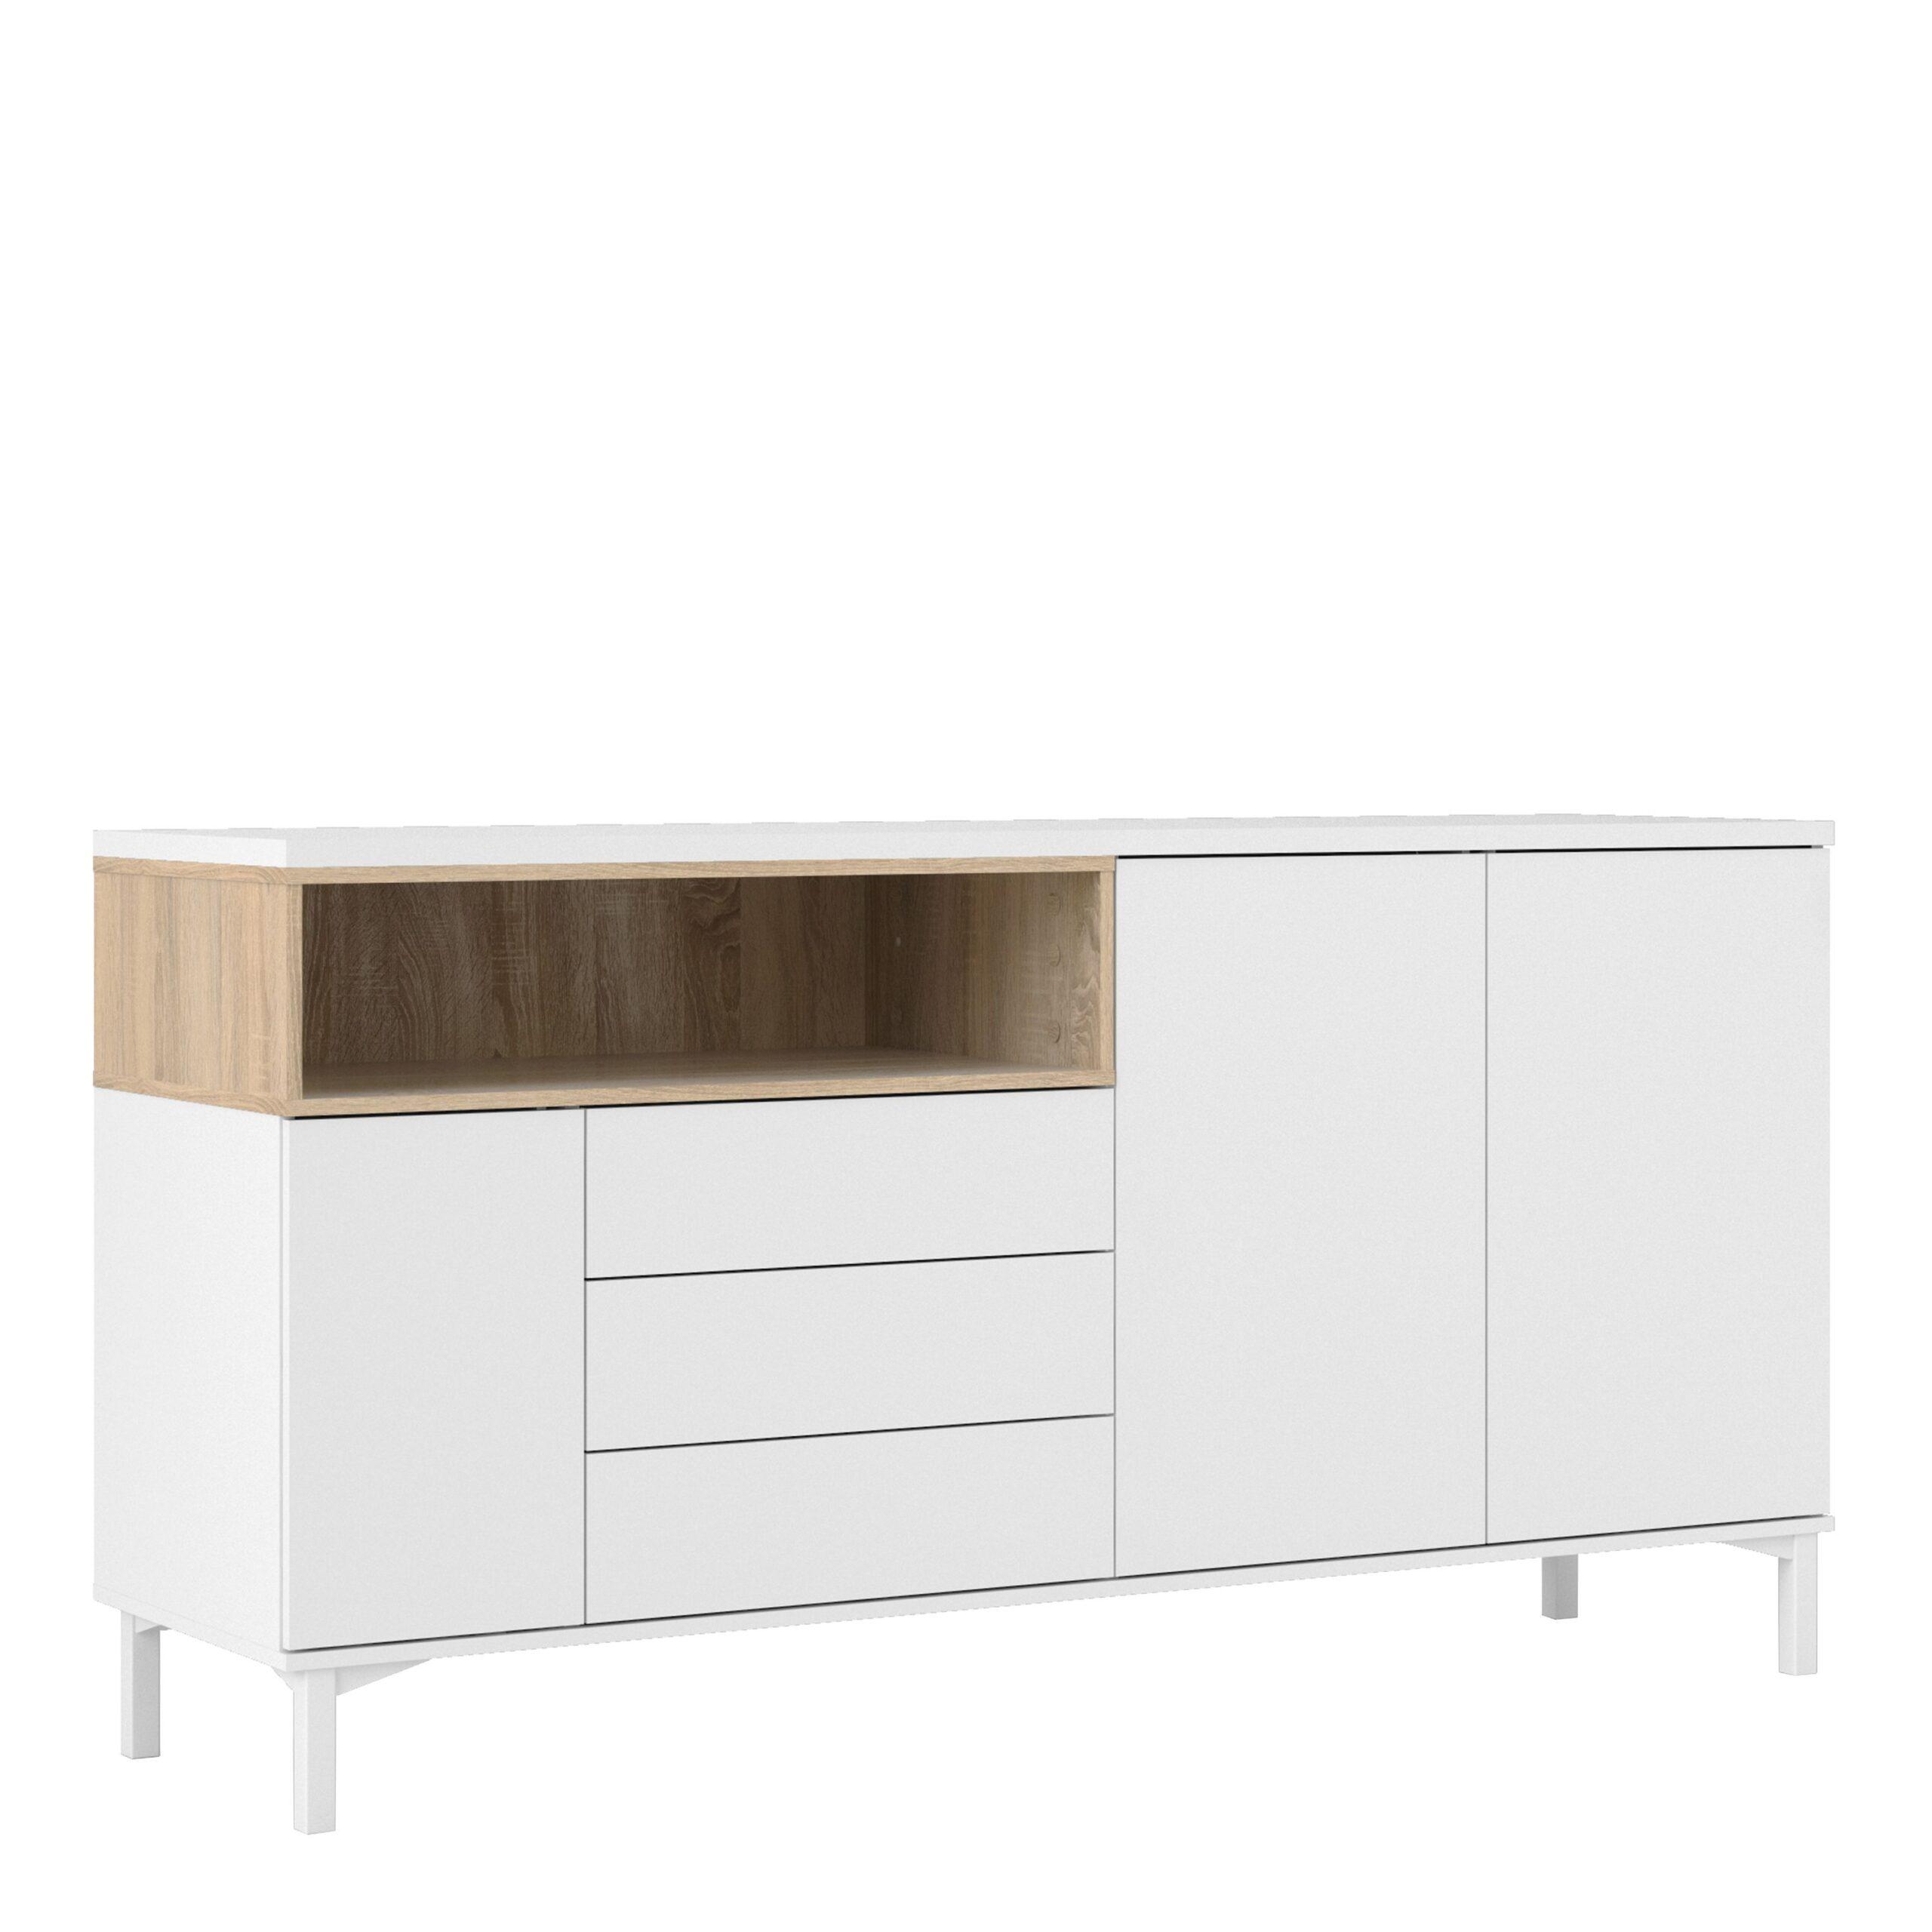 Ramen Sideboard 3 Drawers 3 Doors in White and Oak